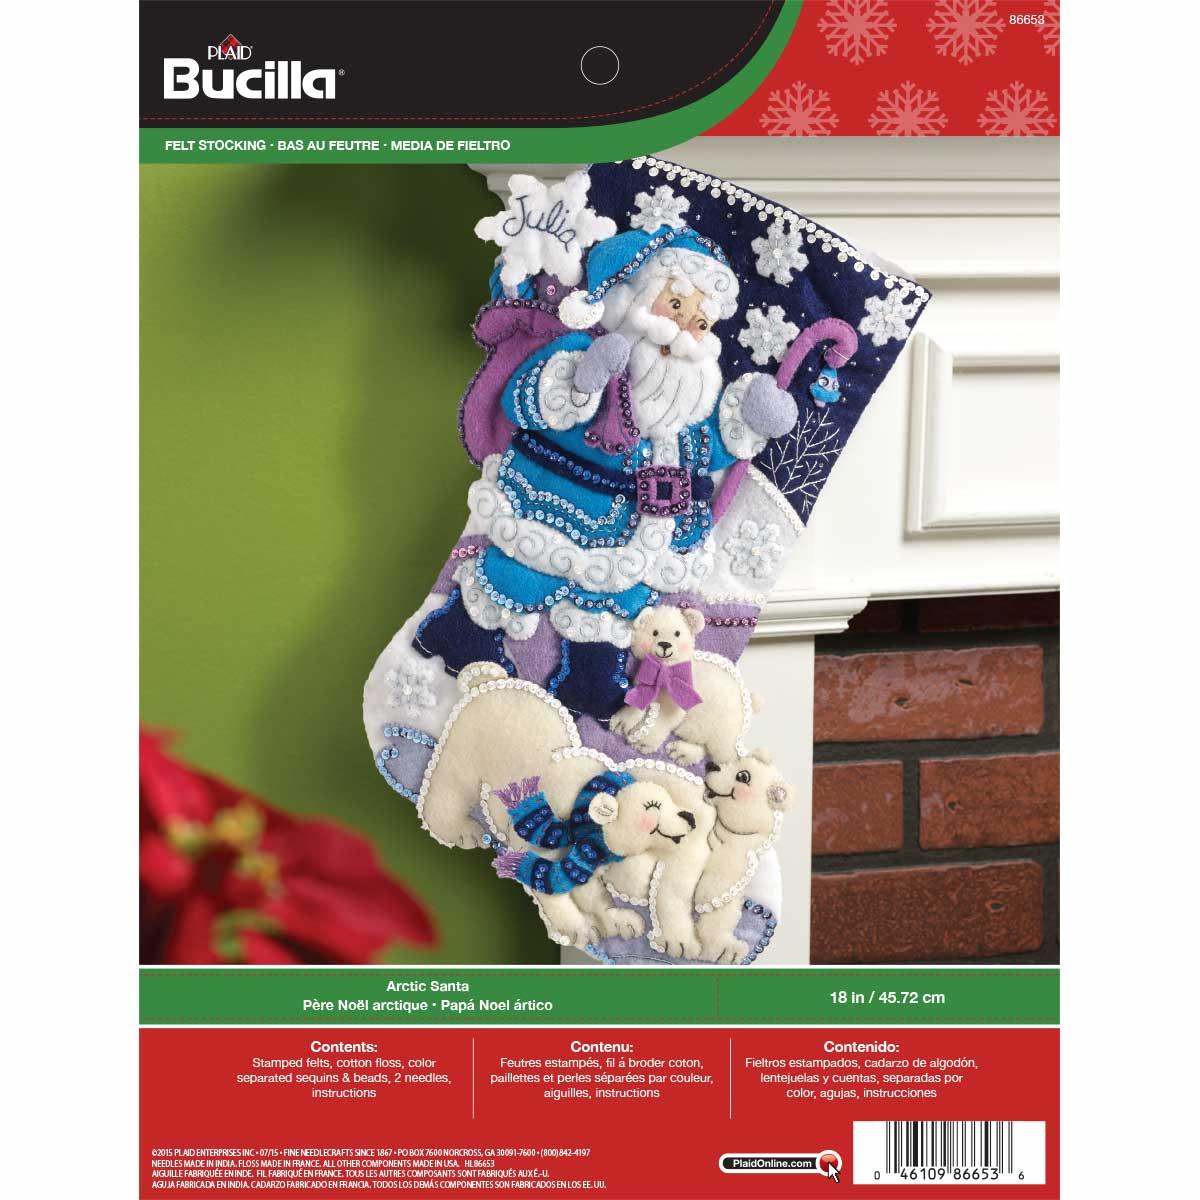 Bucilla ® Seasonal - Felt - Stocking Kits - Arctic Santa - 86653